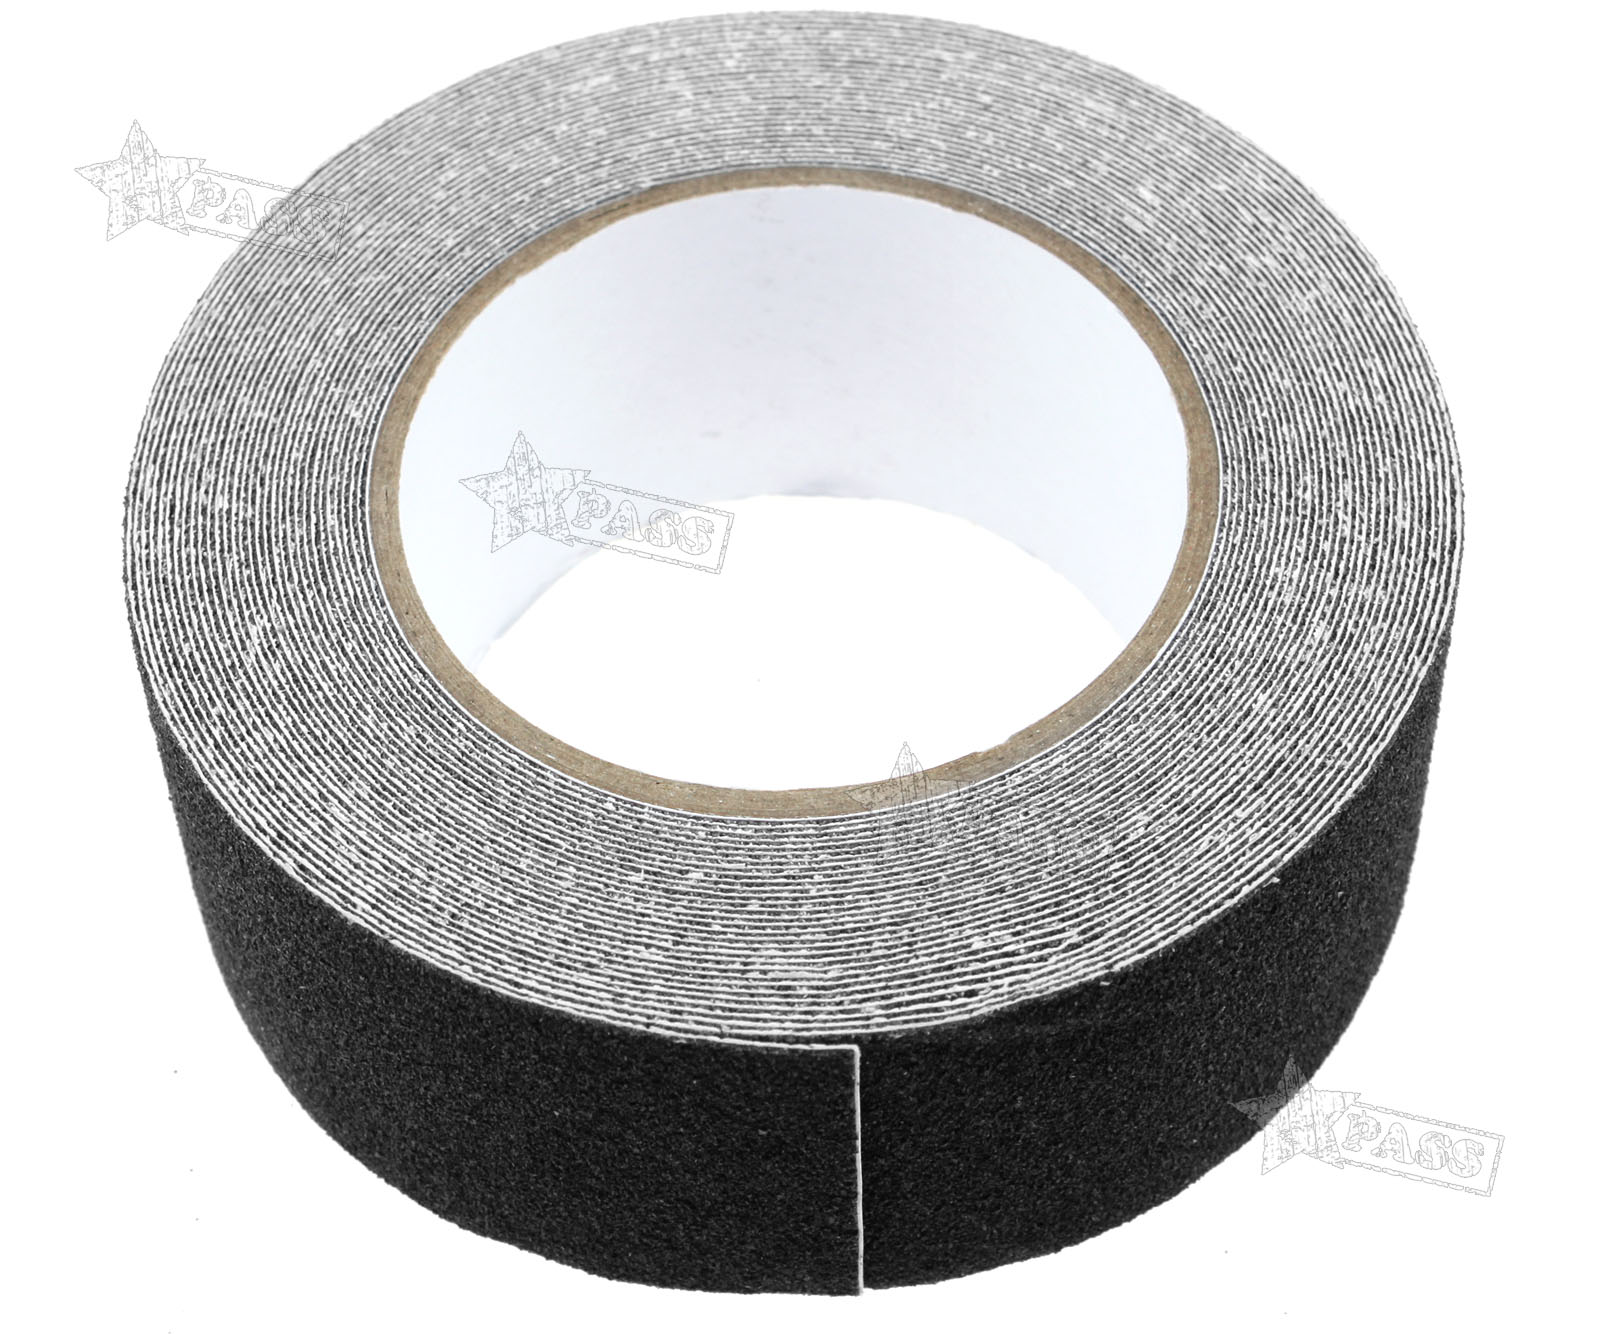 BT-Mutli-Conformable-Anti-Slip-Tape-High-Grip-Non-Slip-Adhesive-Backed-Tape thumbnail 6